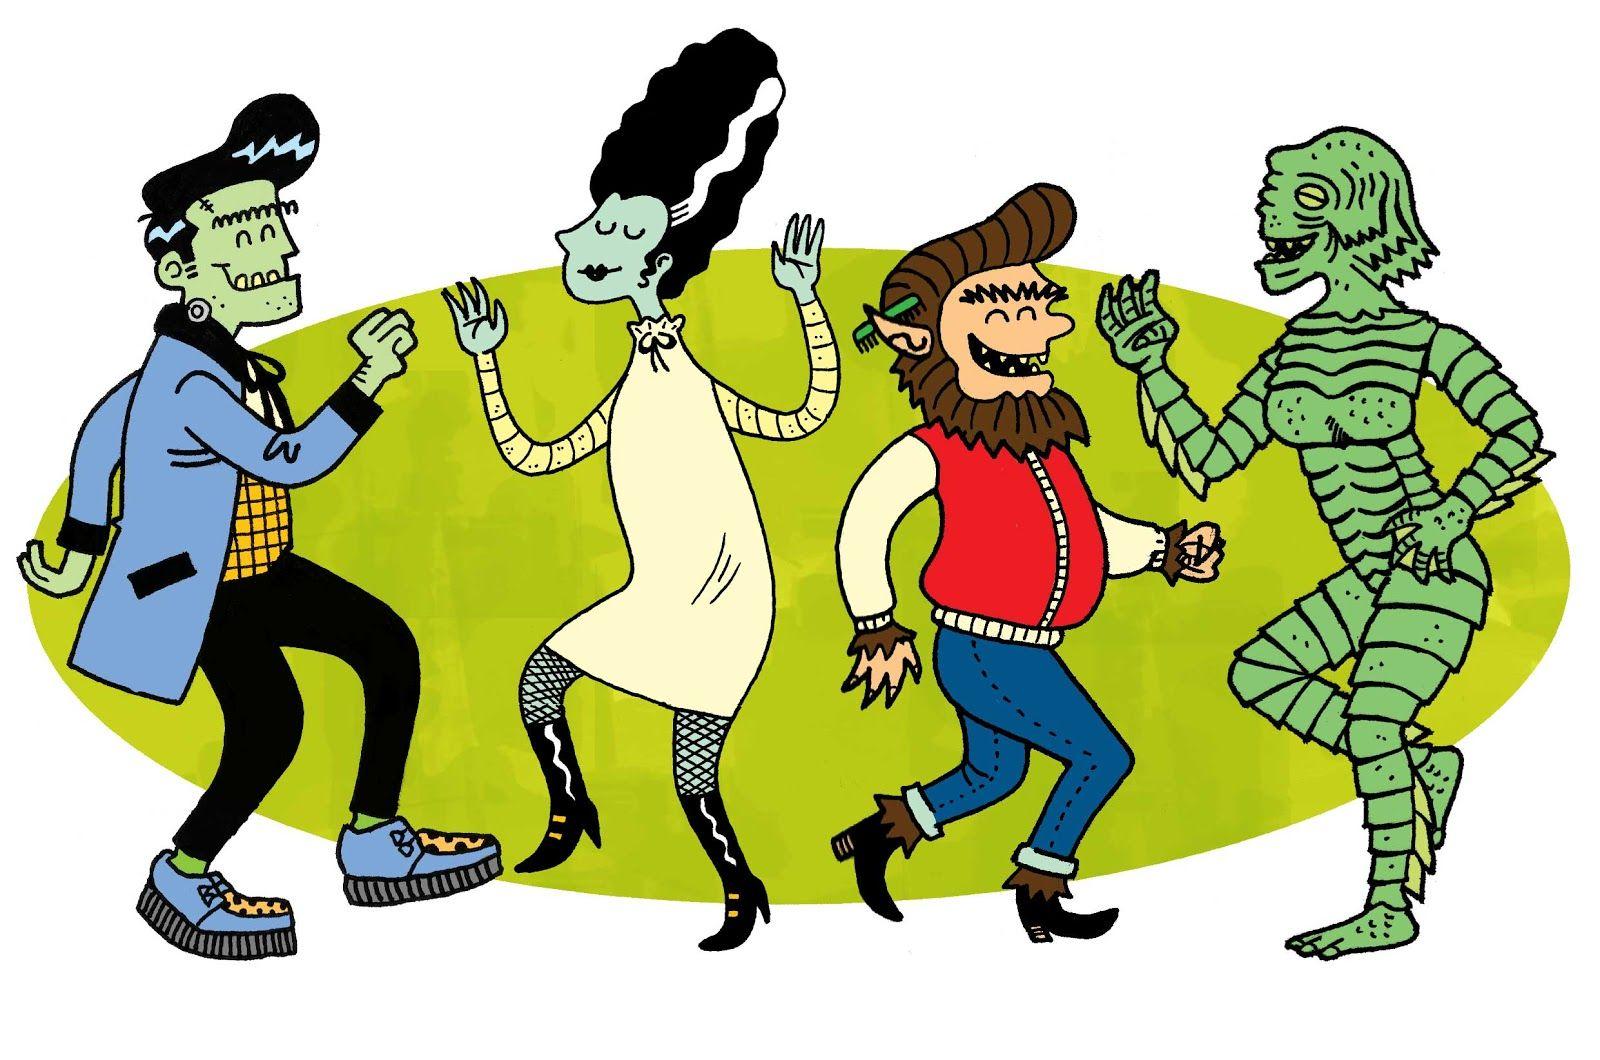 Pin By California Girl2 On Scary Oooooooo Universal Monstrosities Halloween Dance Halloween Dance Party Halloween Songs